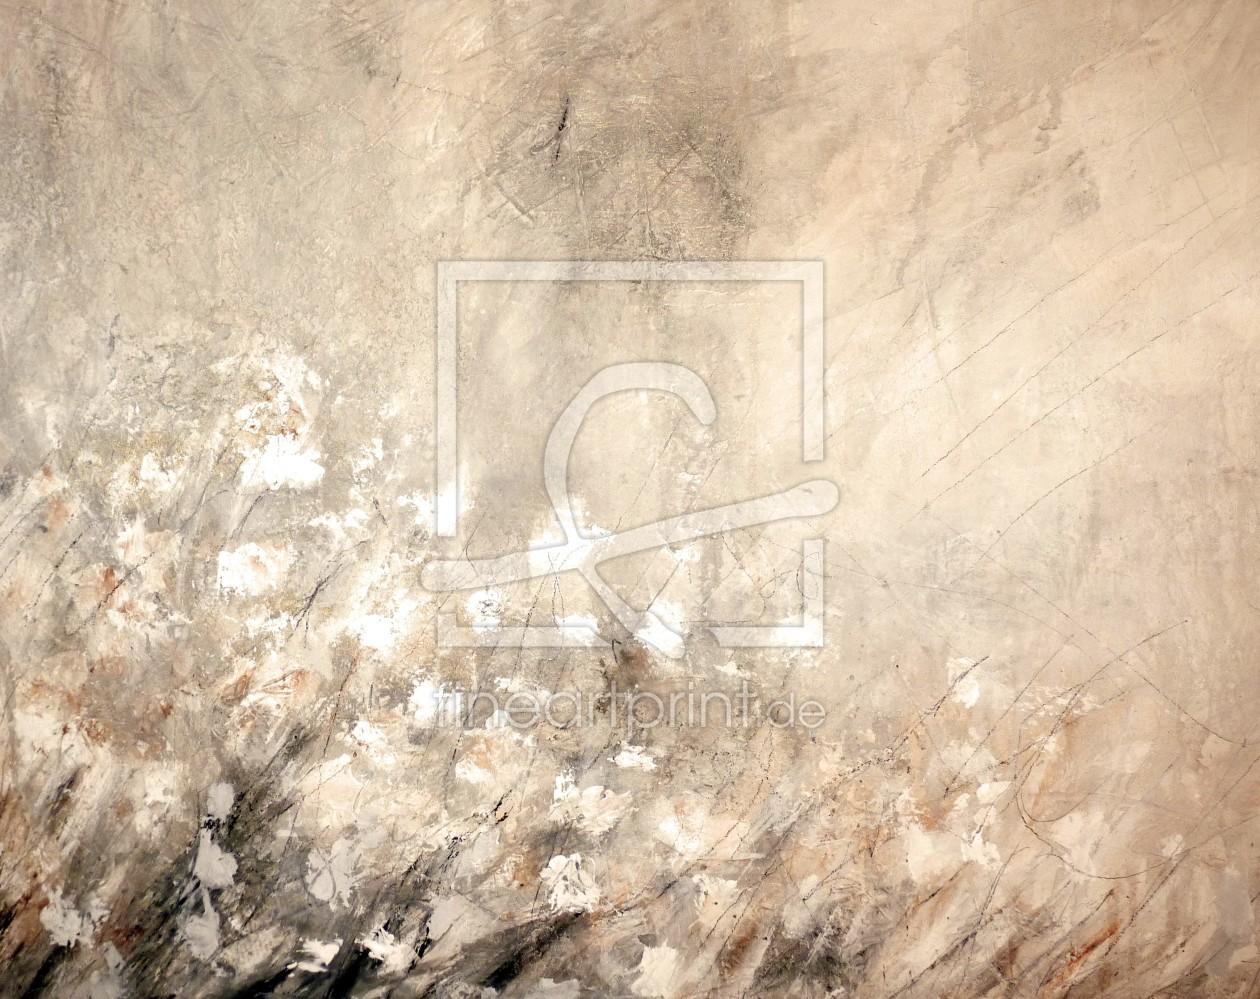 http://www.fineartprint.de/dynimage/bigpreview/0010000000/10771000/10771063.jpg